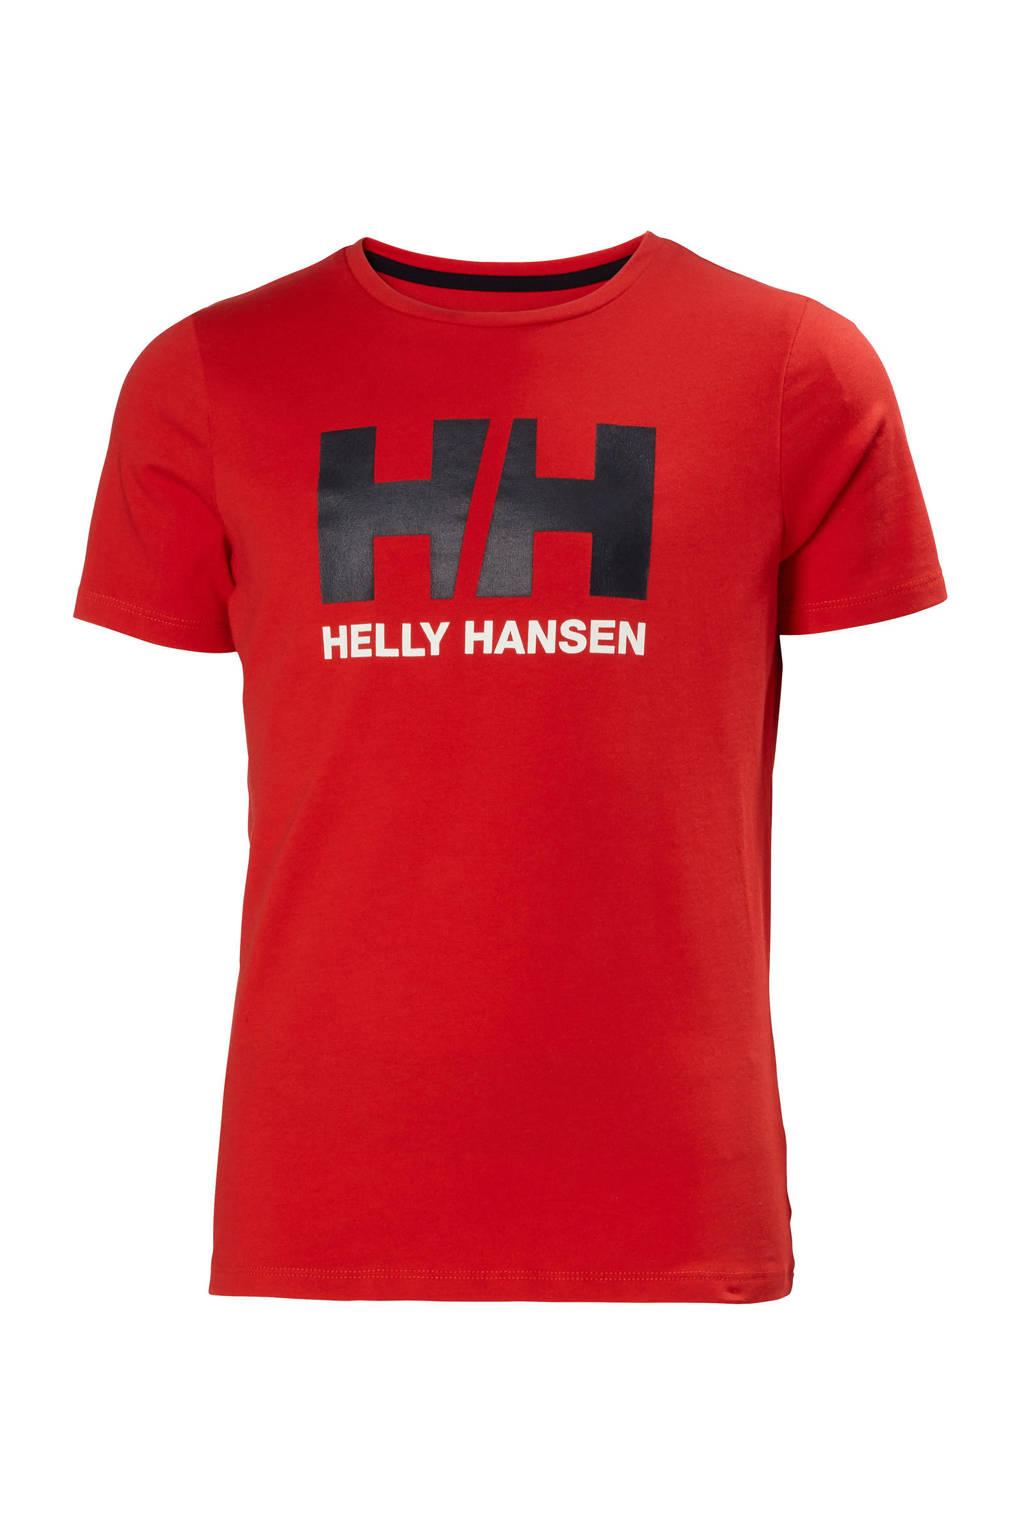 Helly Hansen T-shirt rood, Rood